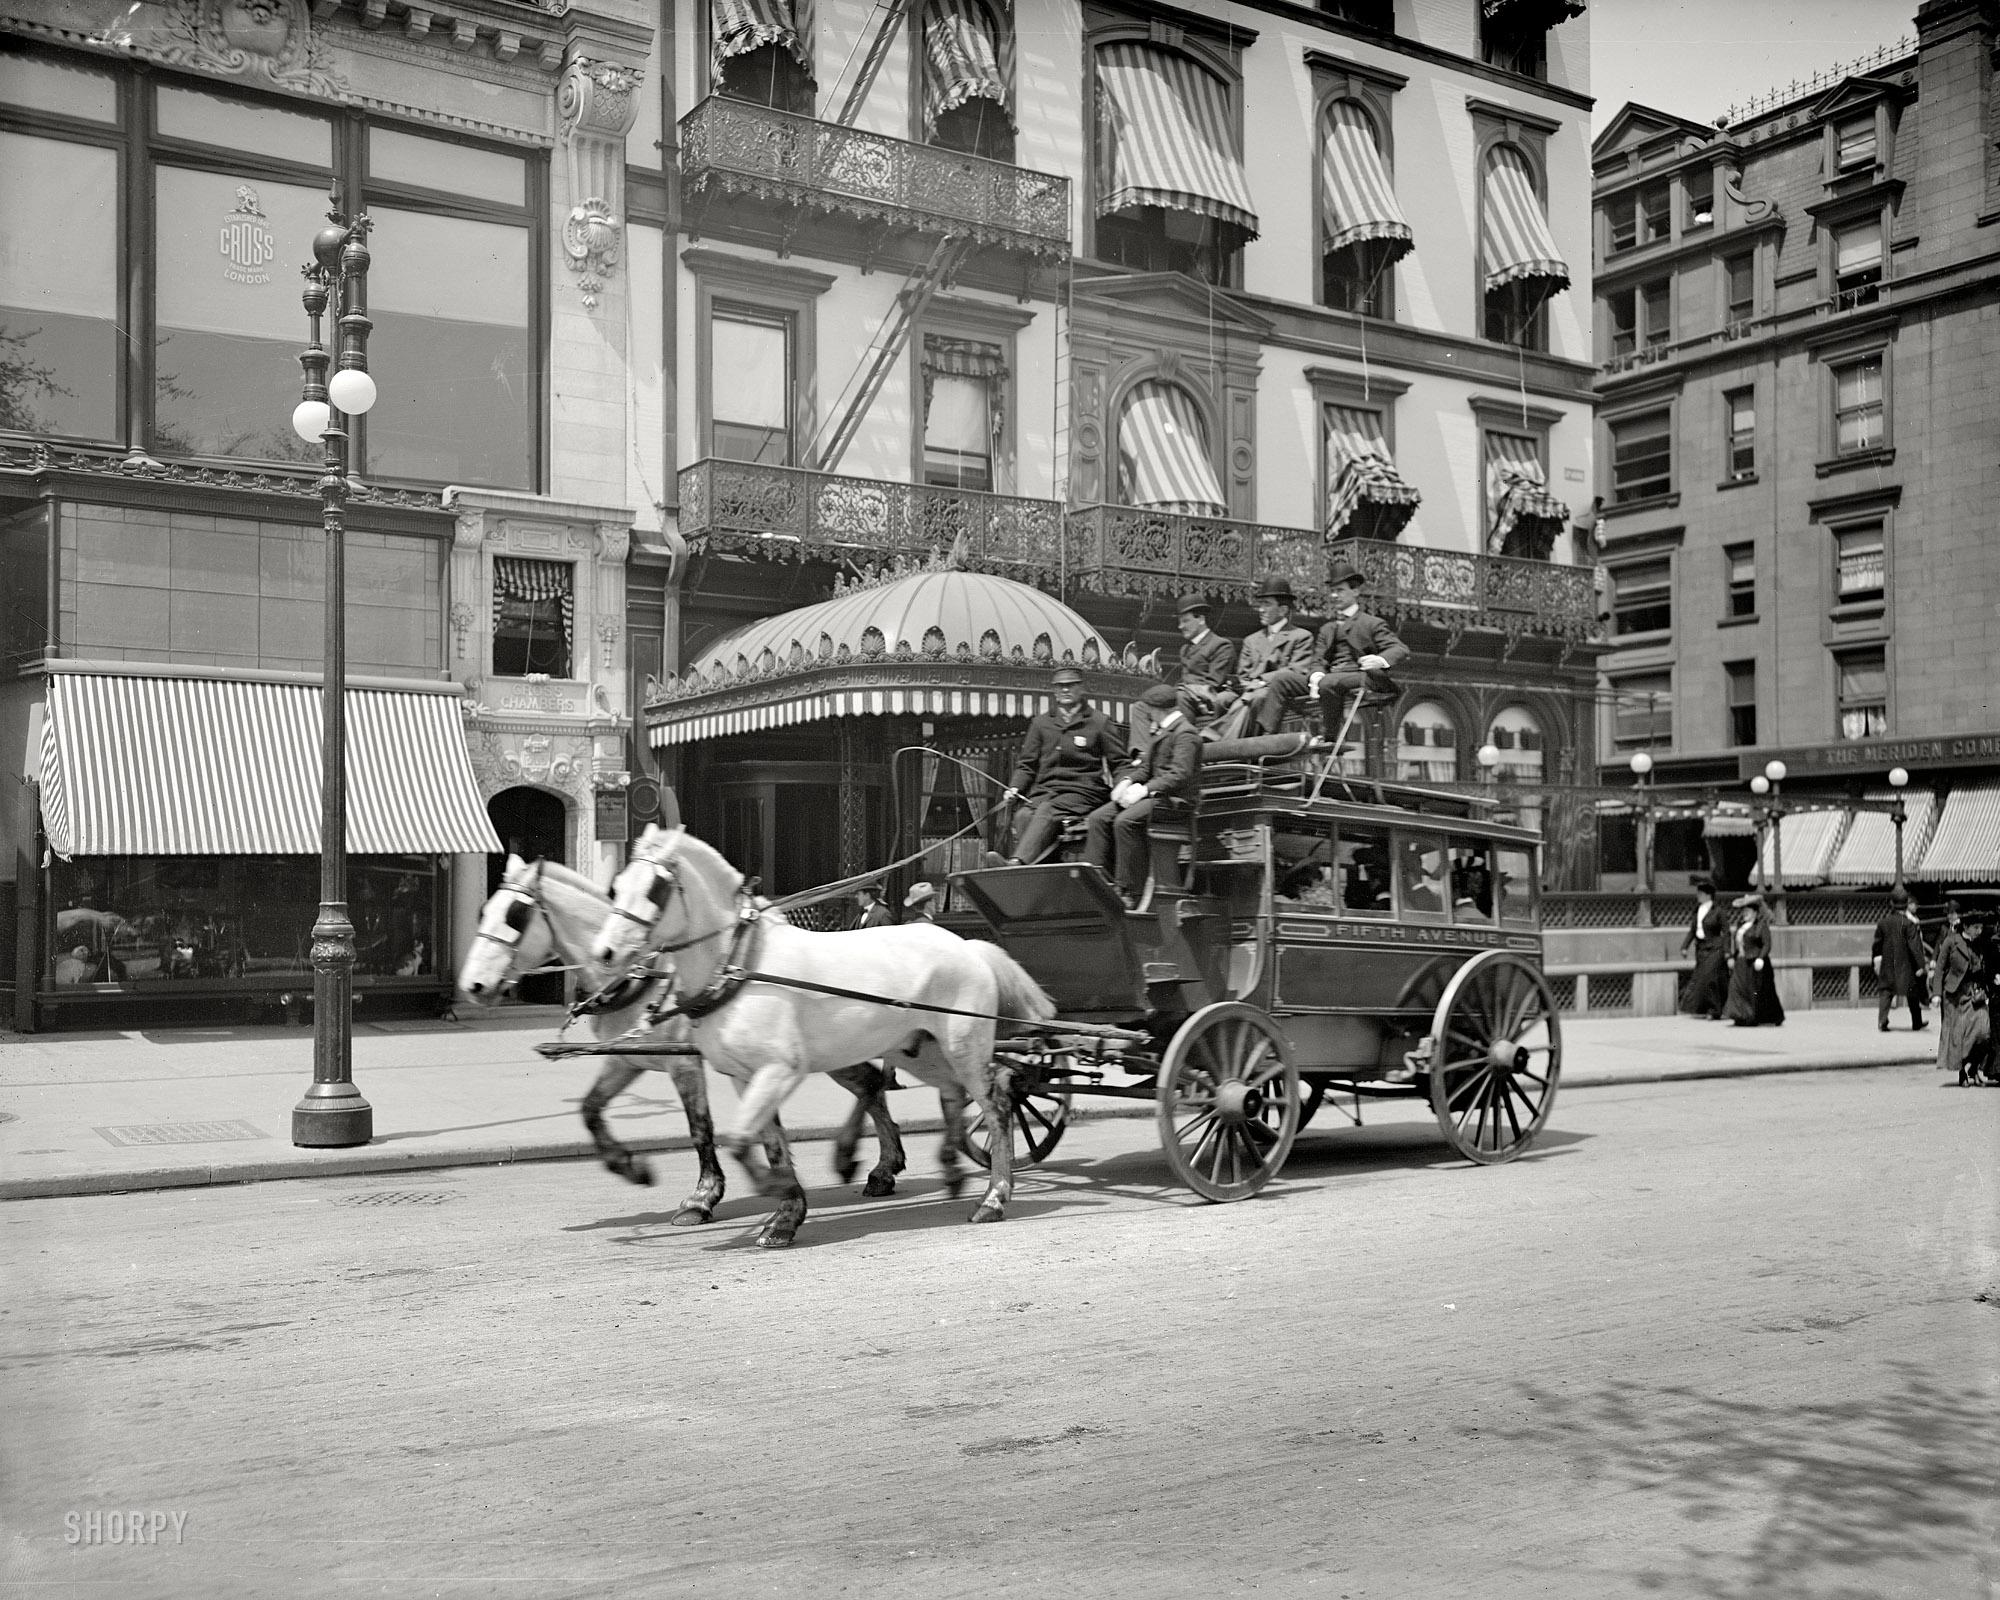 Fifth Avenue. 1900.